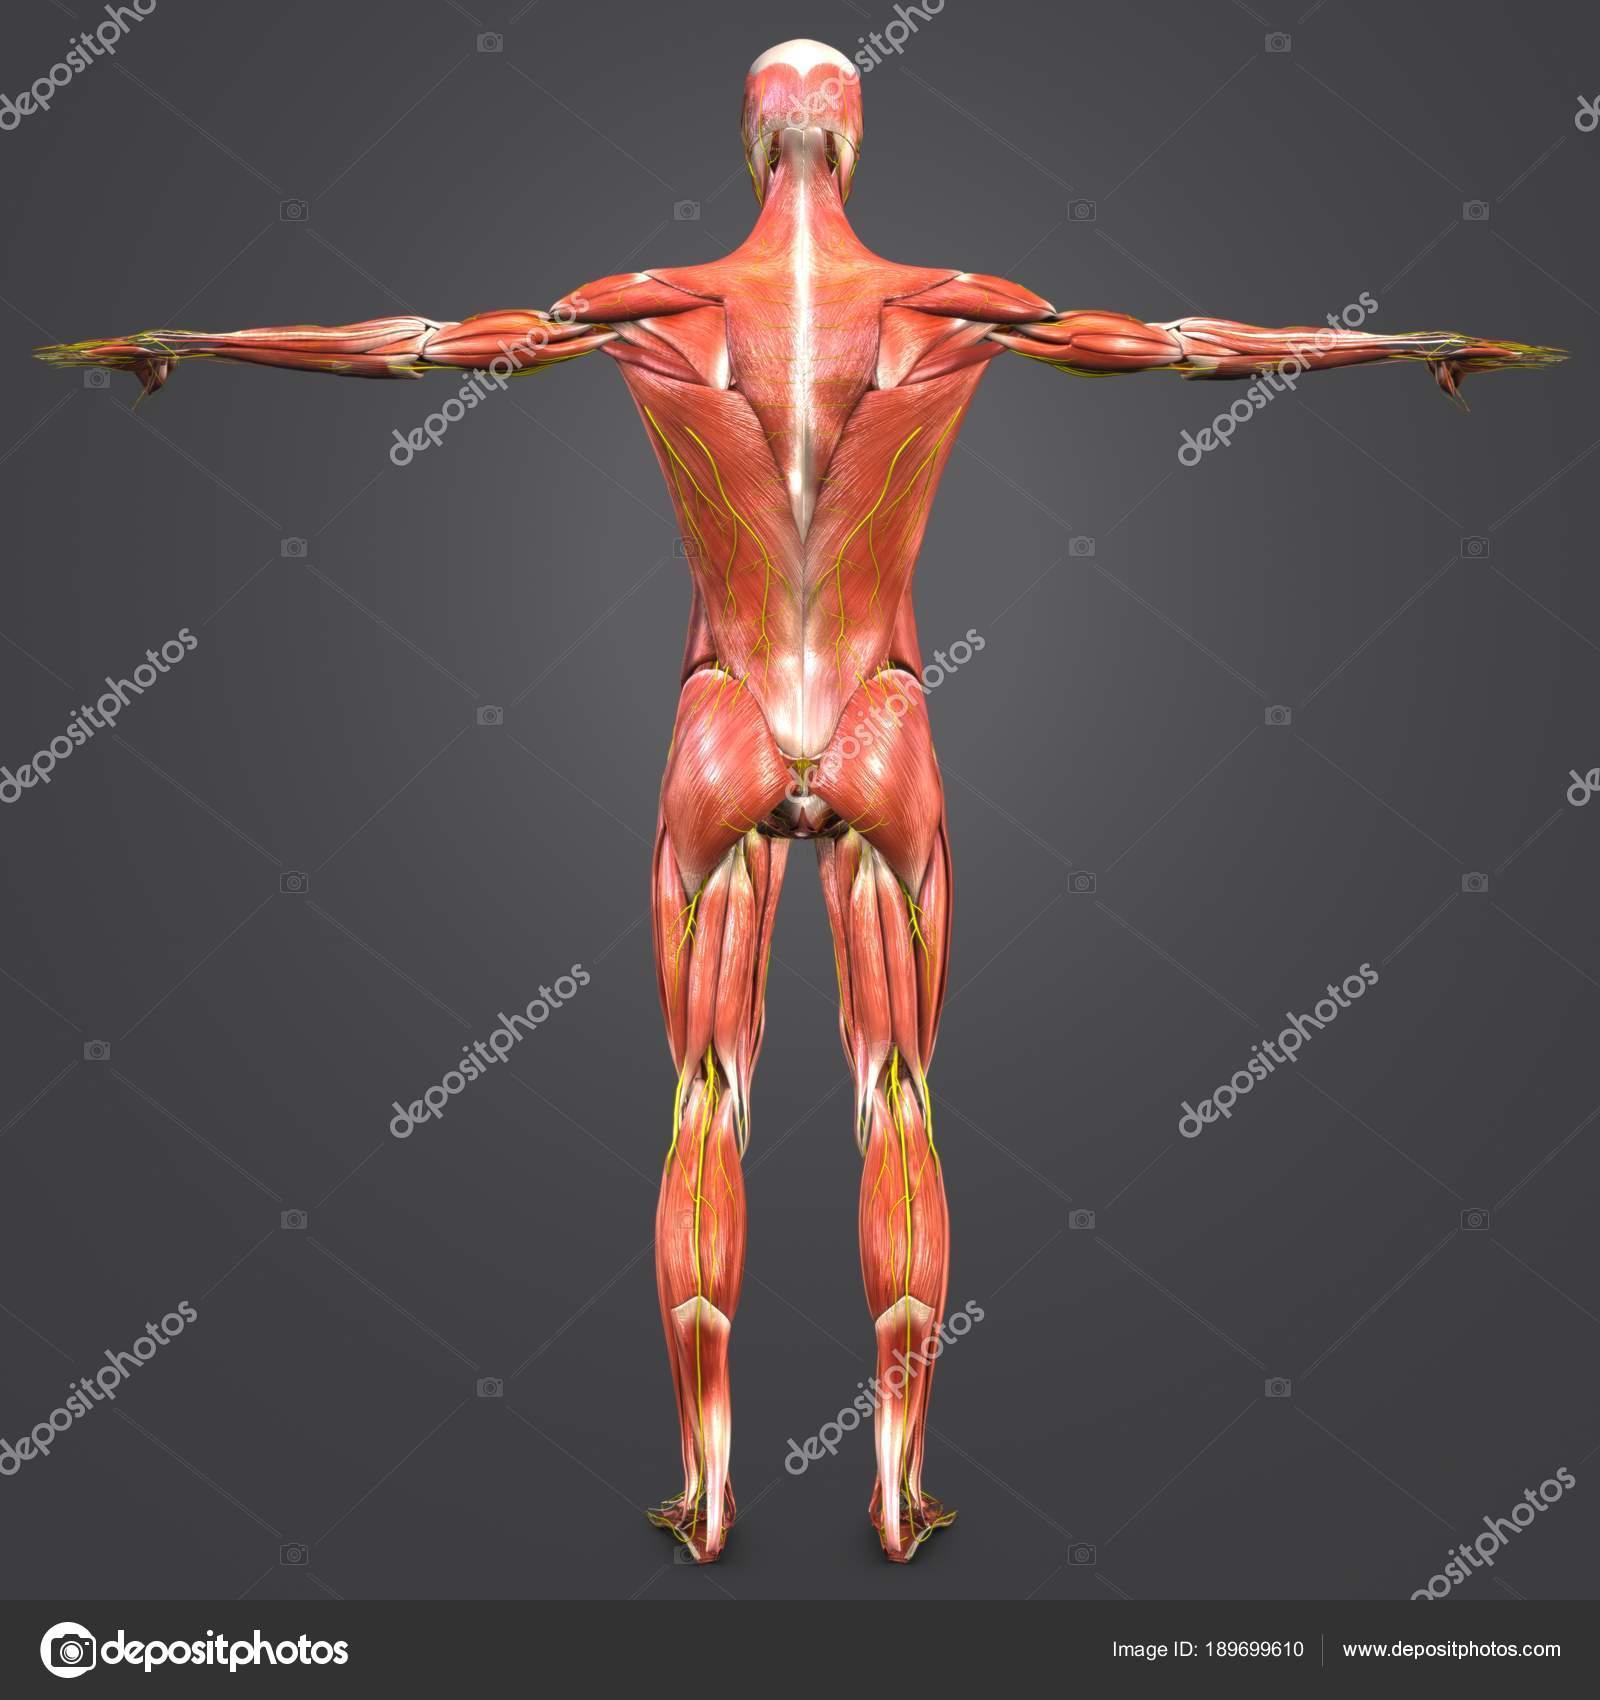 Colorful Medical Illustration Human Muscular Anatomy Stock Photo